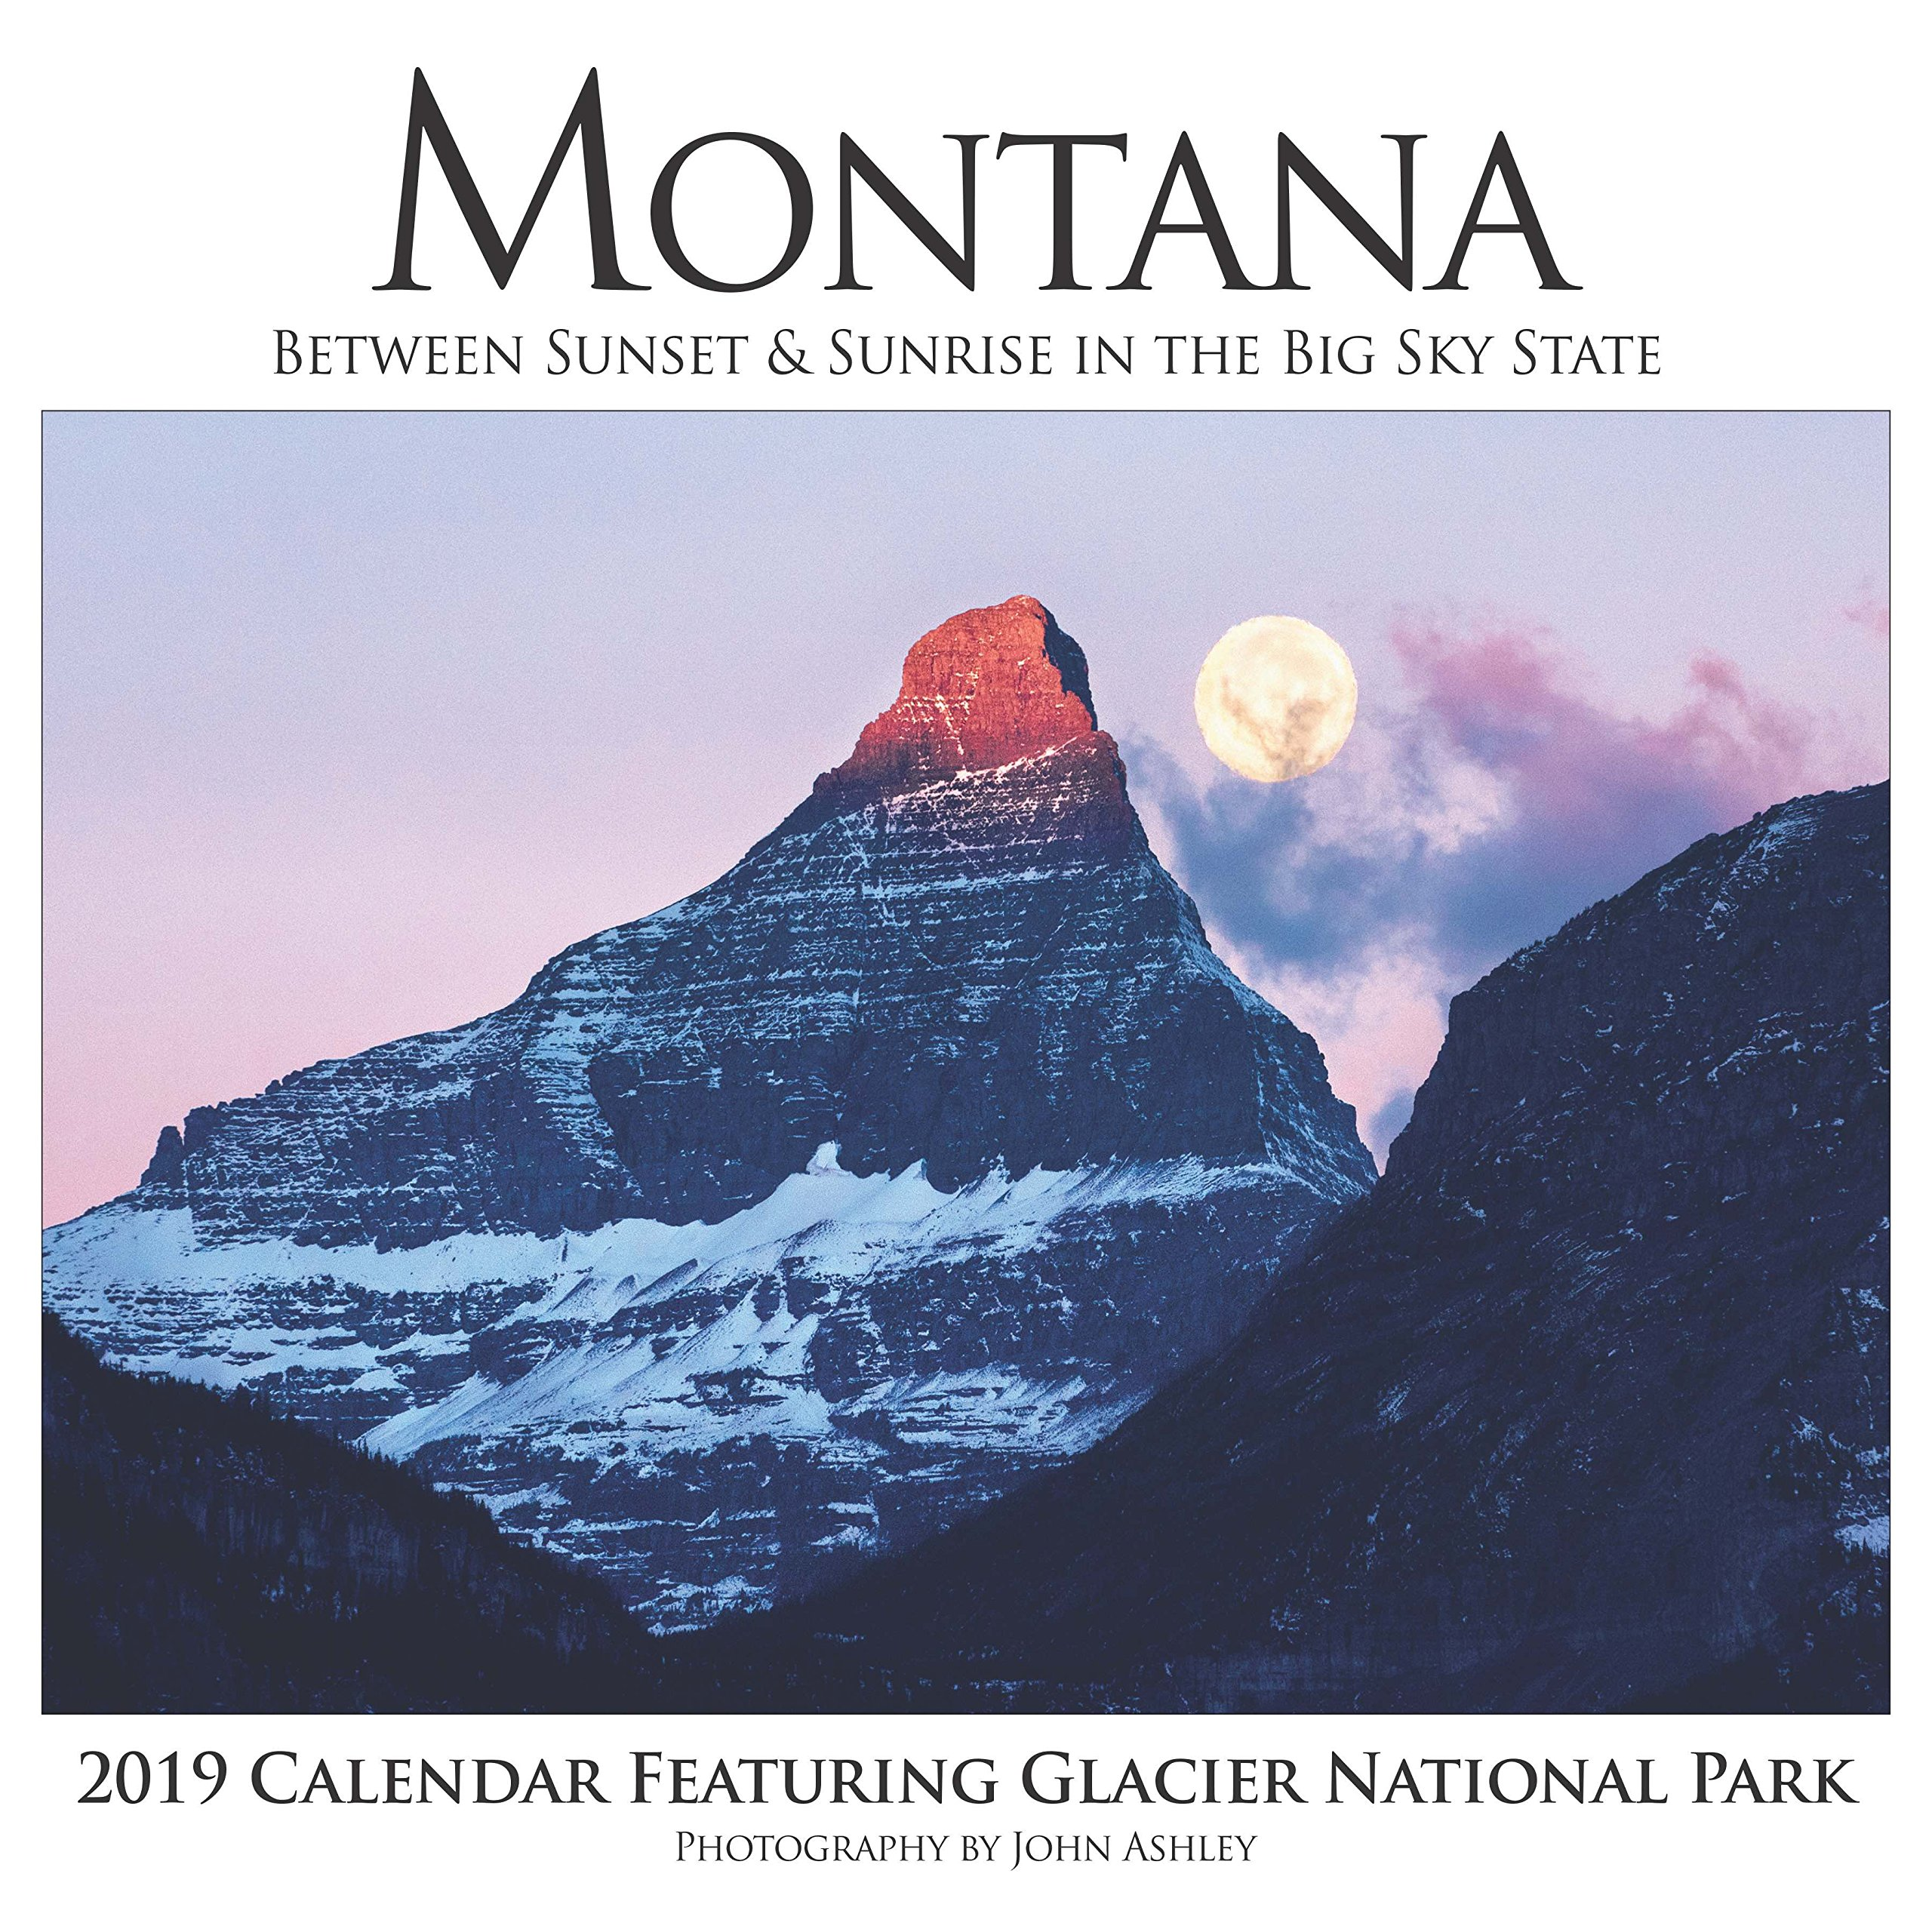 Sunset Sunrise Calendar 2019 2019 Montana Between Sunset & Sunrise in the Big Sky State Wall